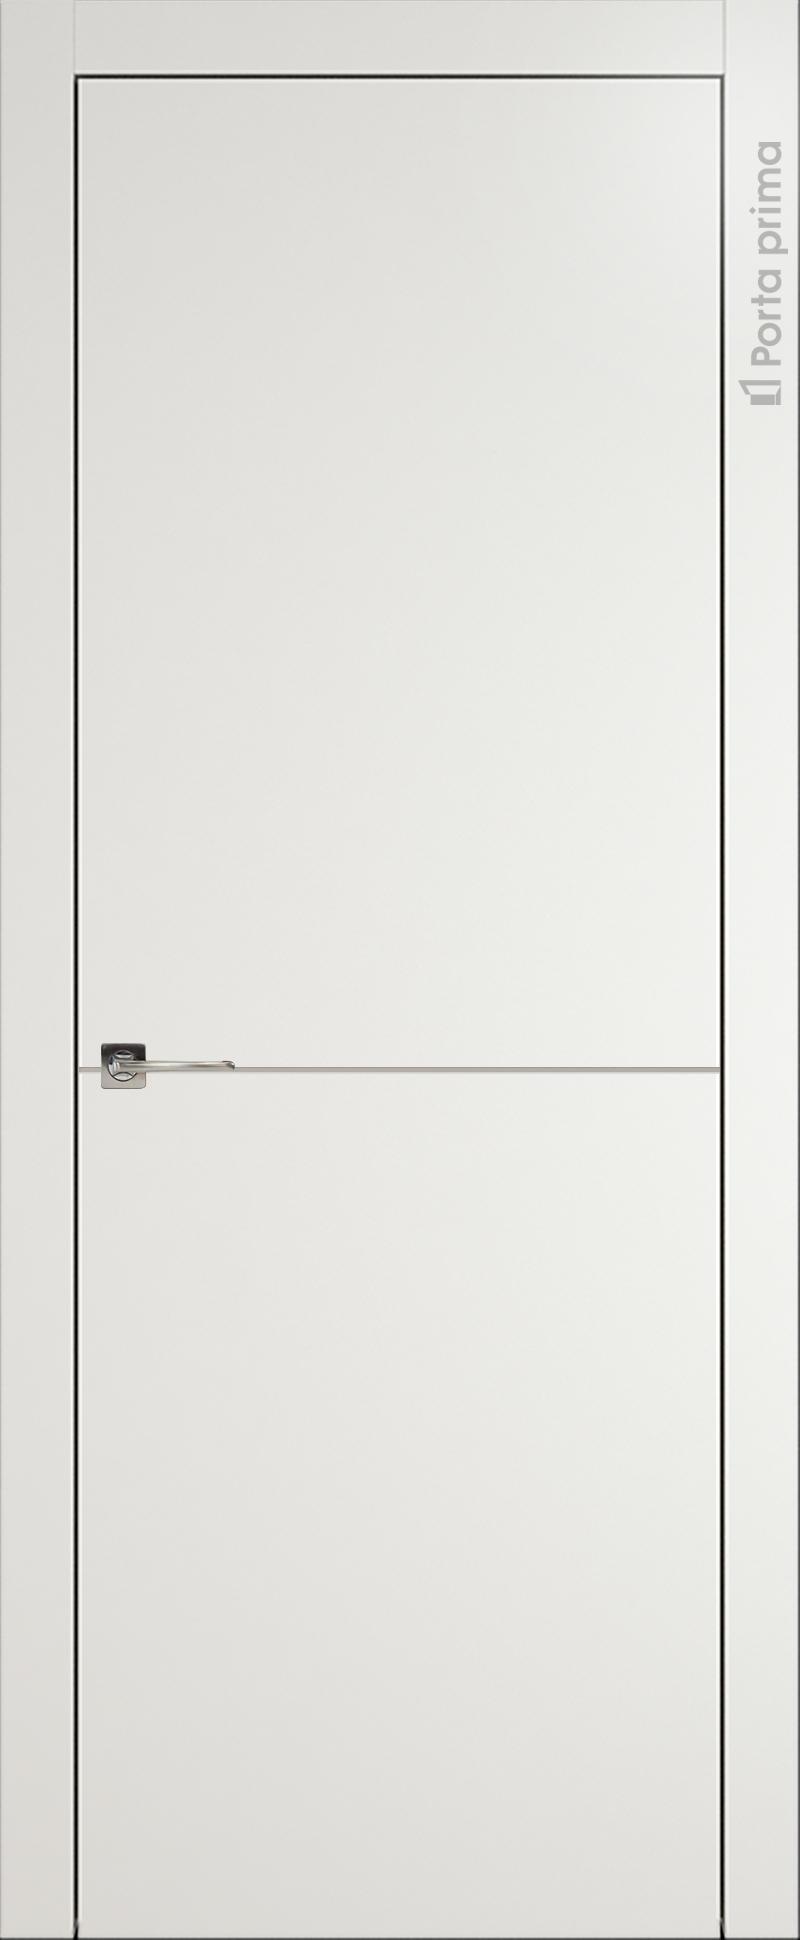 Tivoli Б-2 цвет - Бежевая эмаль (RAL 9010) Без стекла (ДГ)